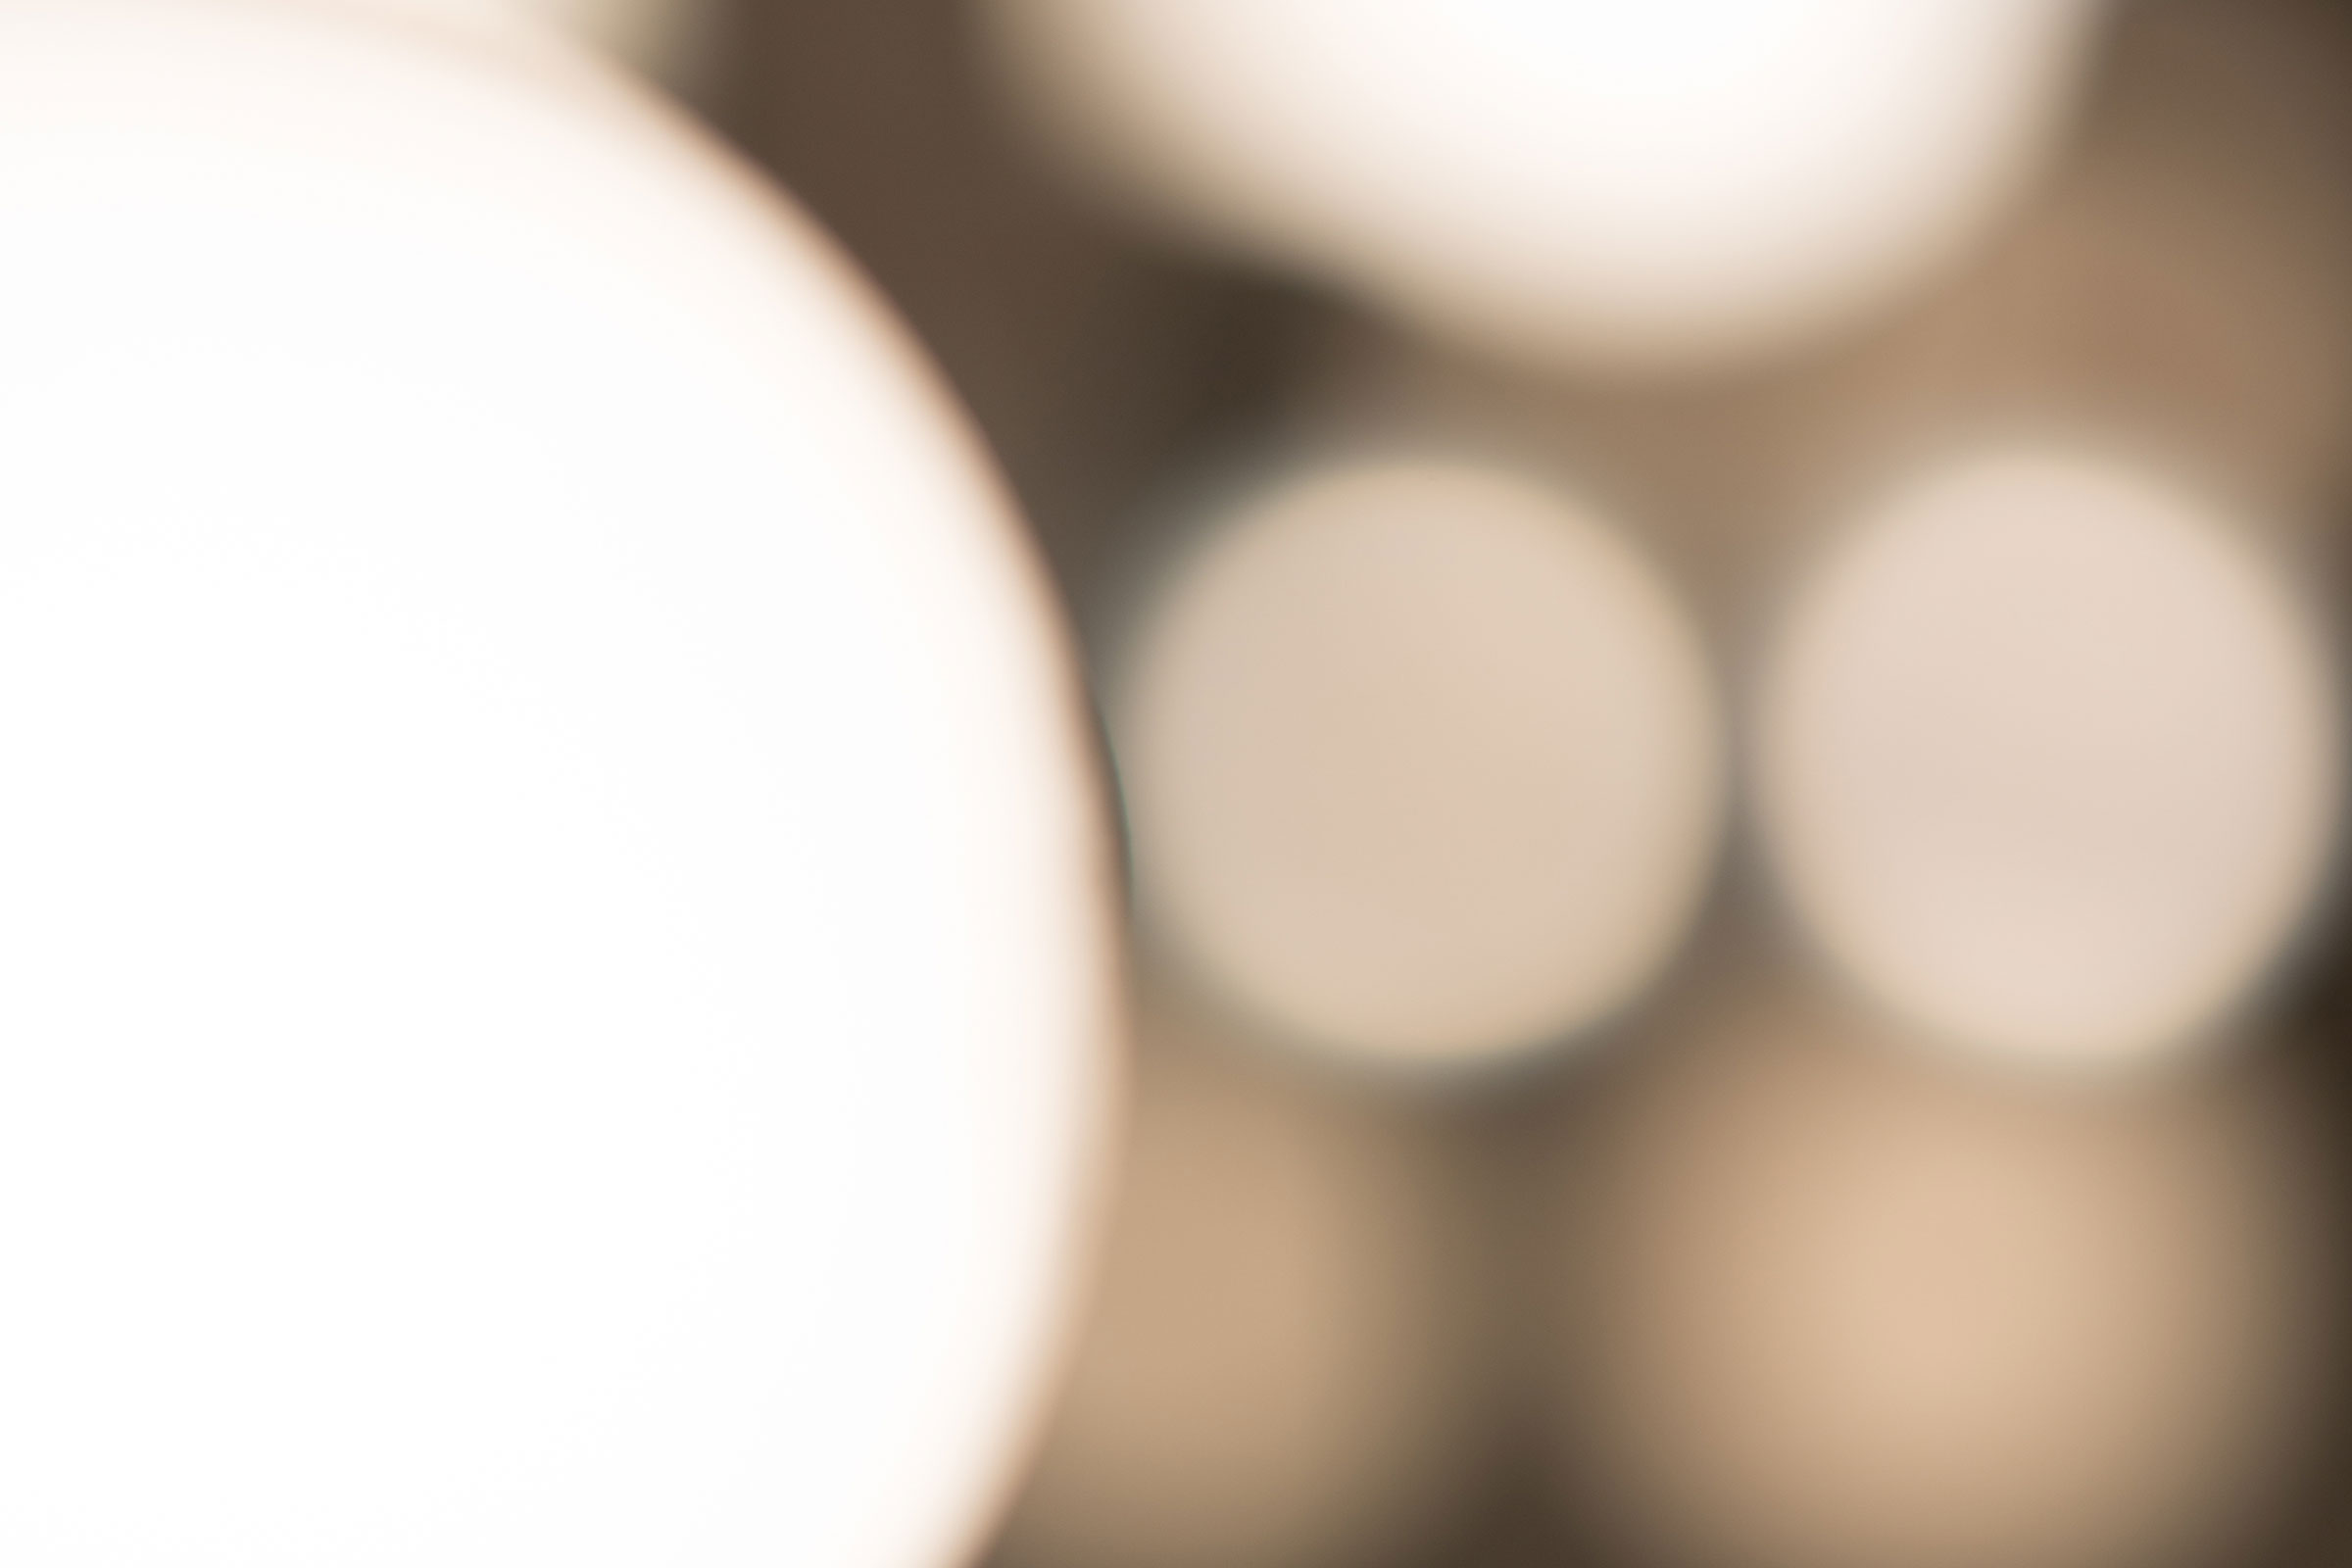 blurred lights close up